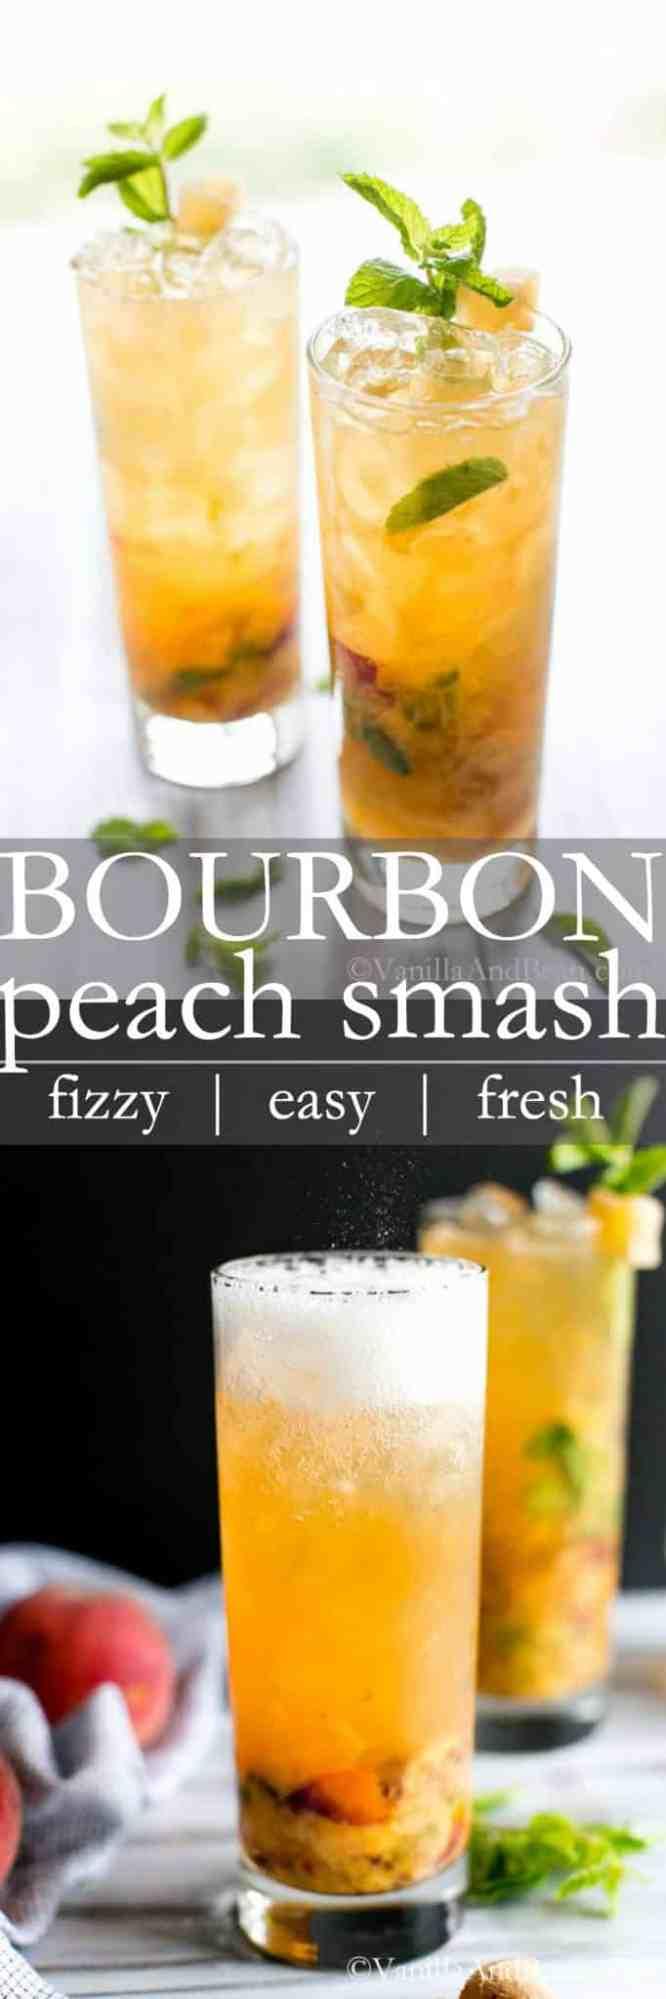 Bourbon Peach Cocktail